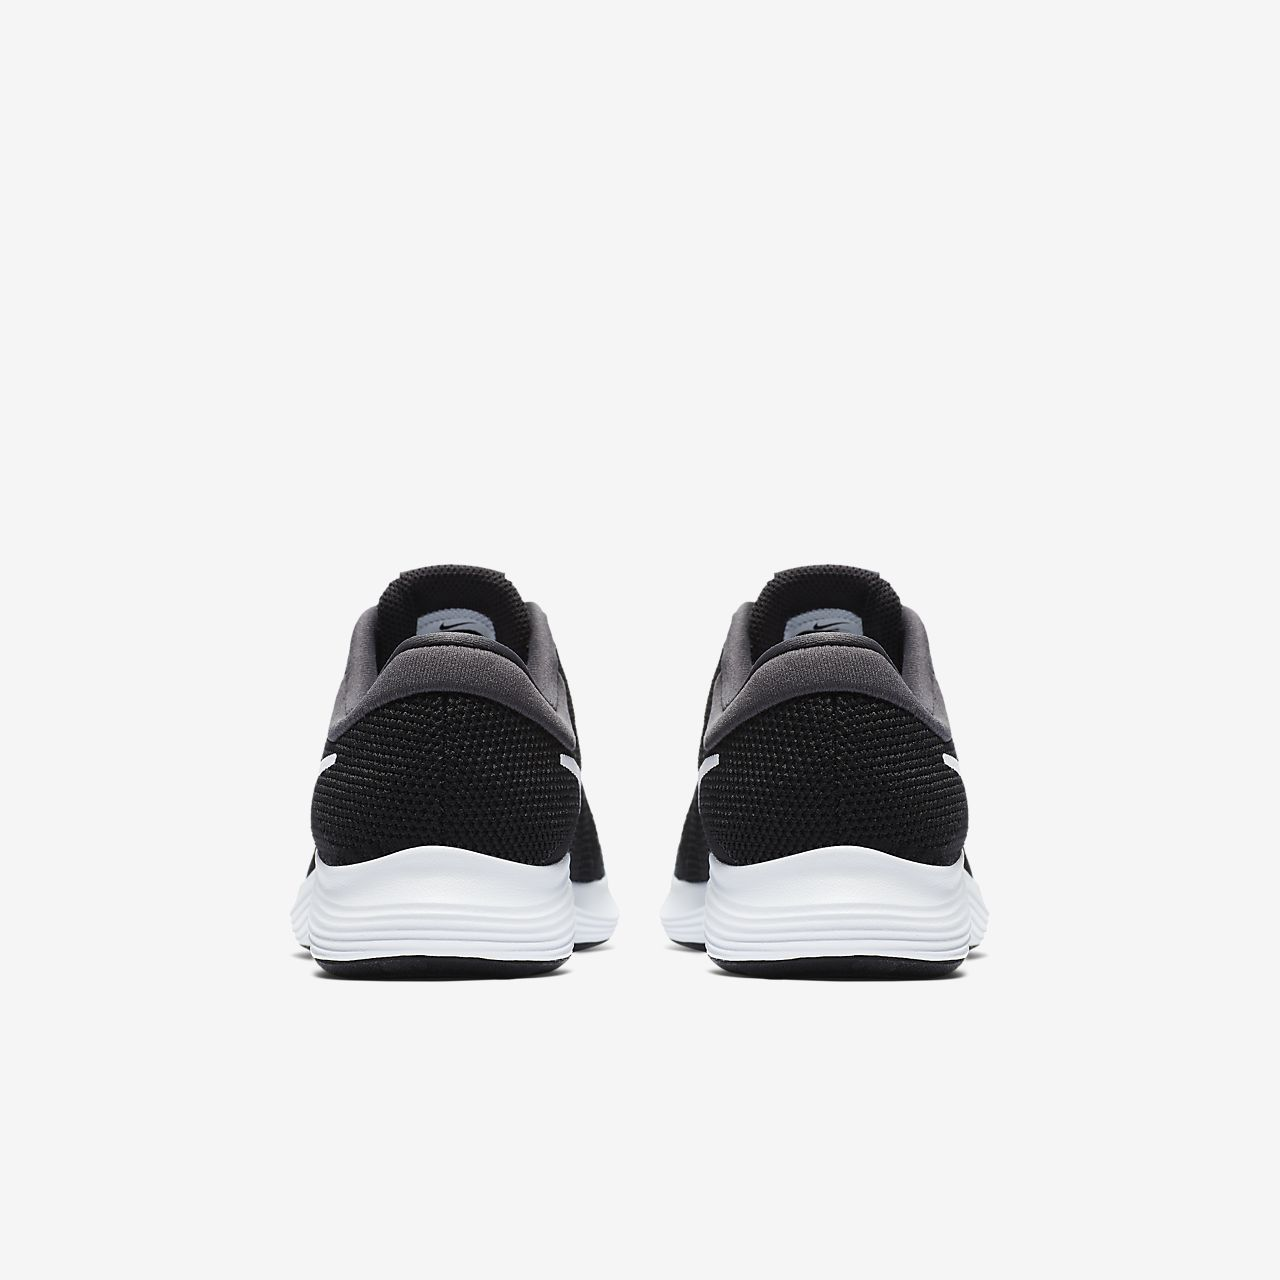 34eb3d7bcfeb Nike Revolution 4 Older Kids  Running Shoe. Nike.com GB